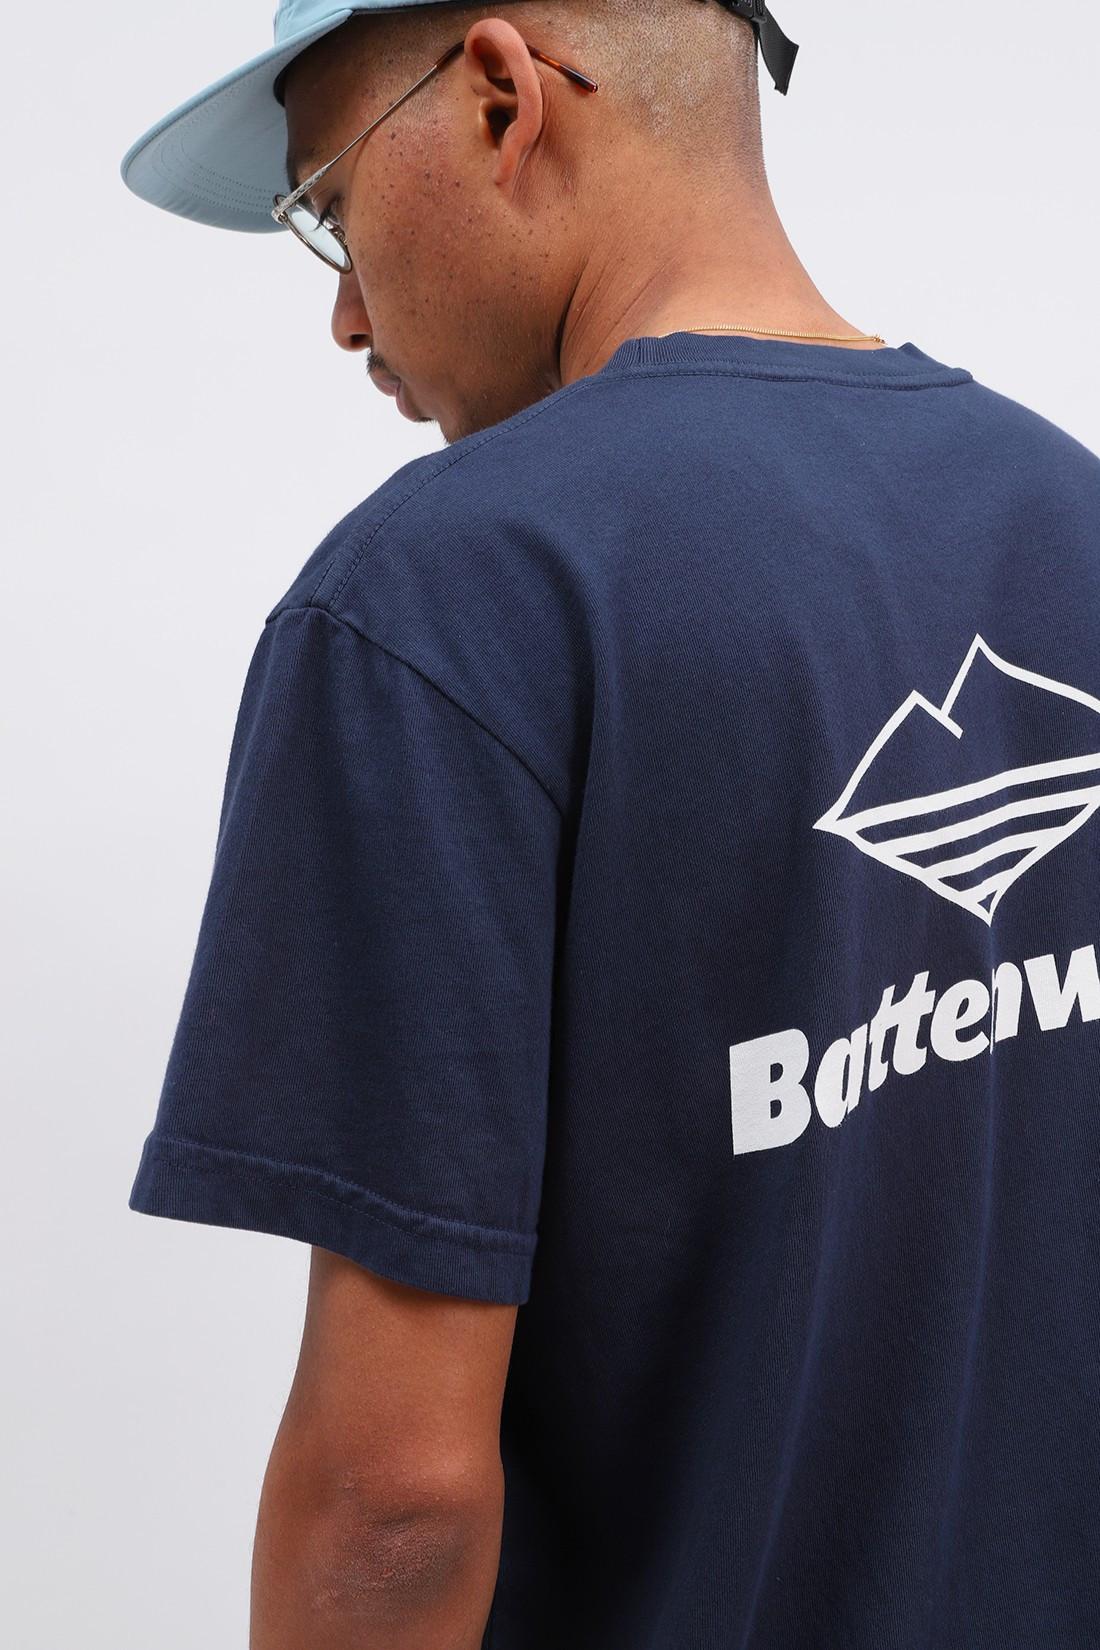 BATTENWEAR / Team s/s pocket tee Navy